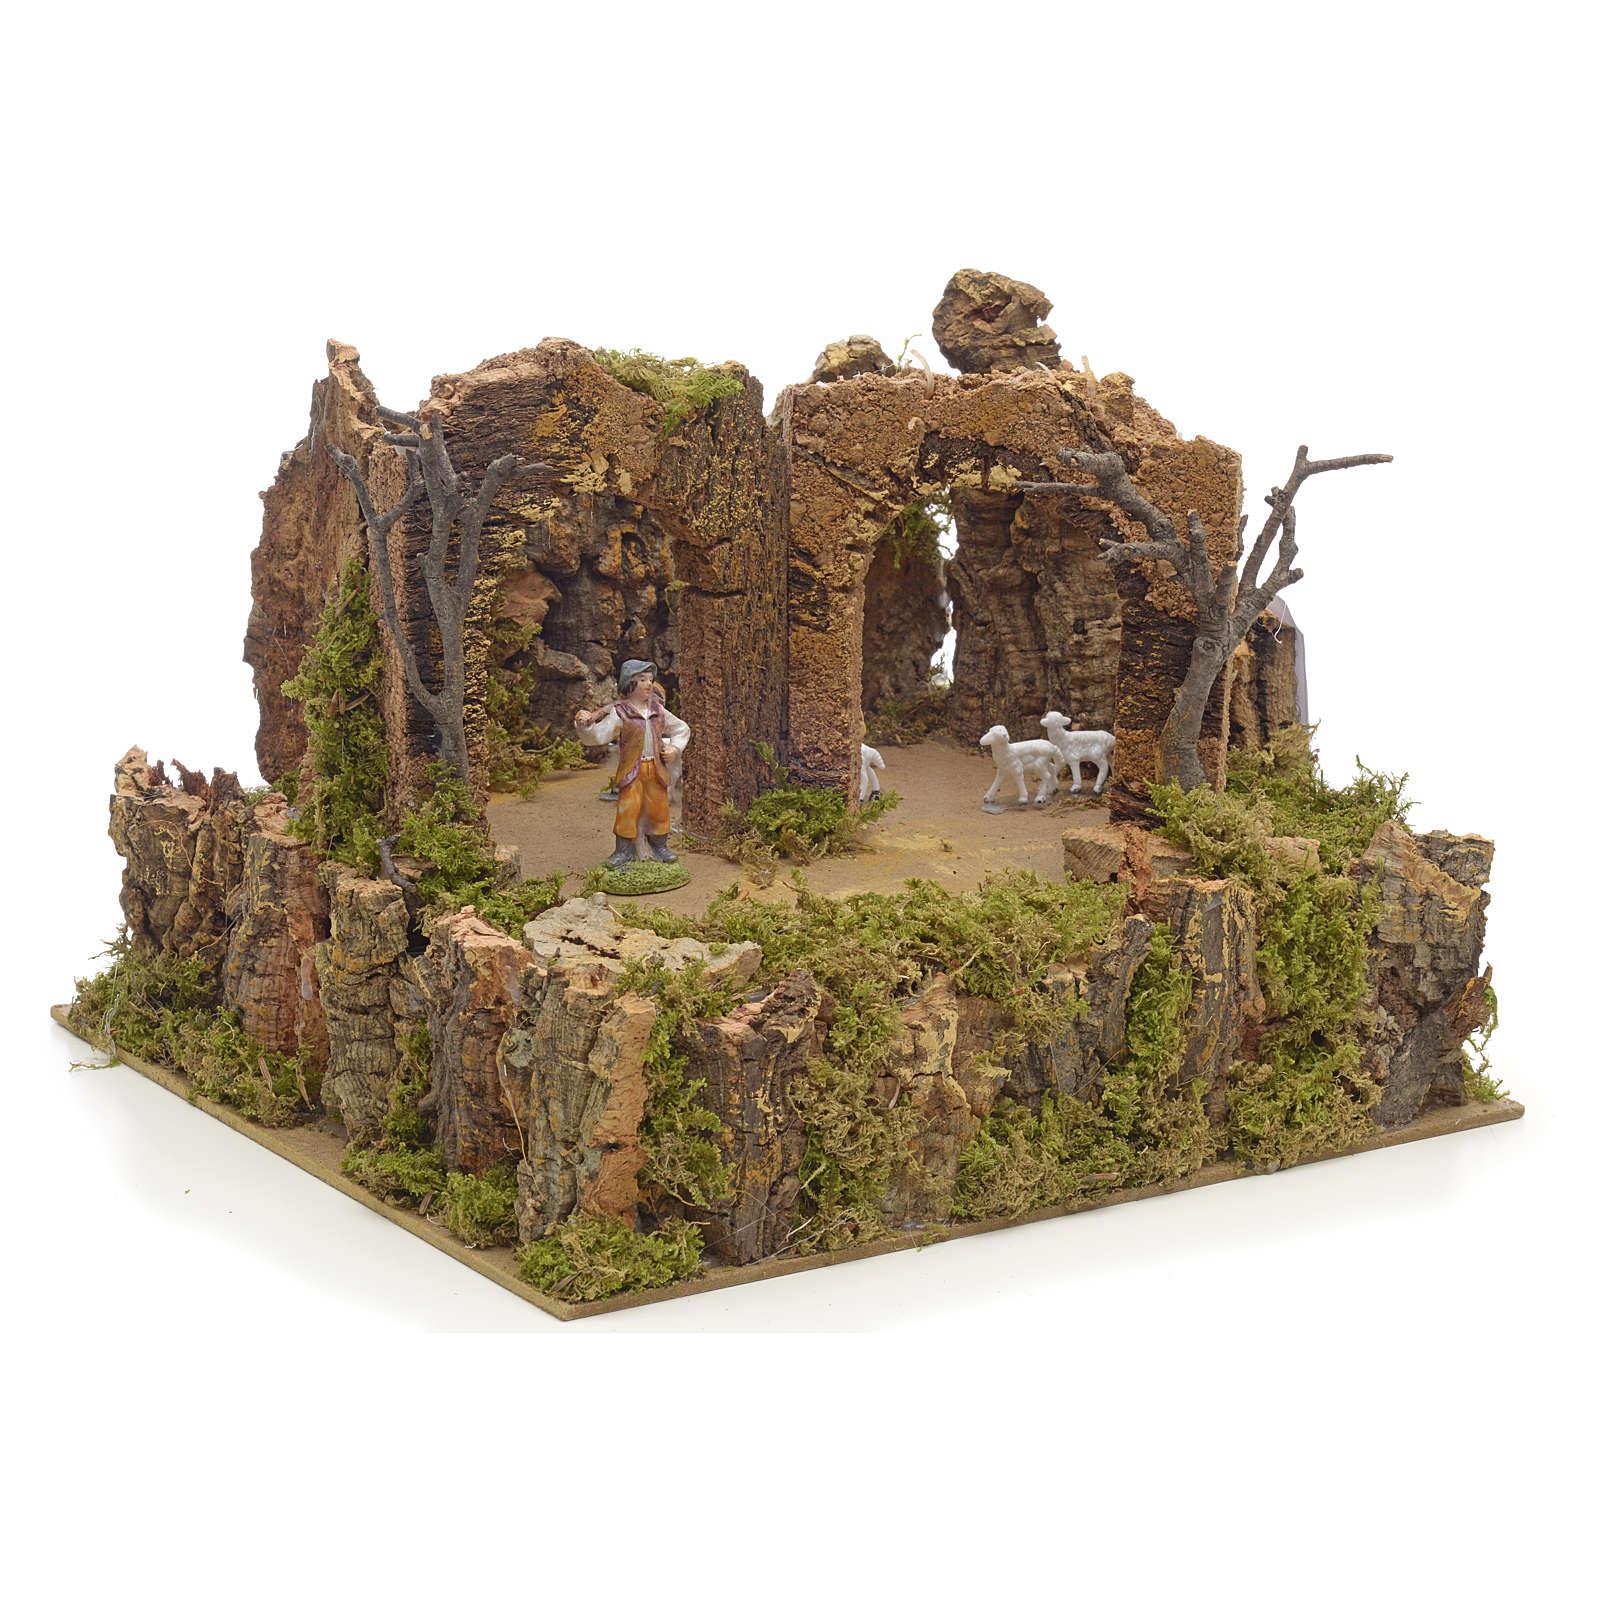 Animated nativity scene figurine, 6cm sheep and shepherd 3